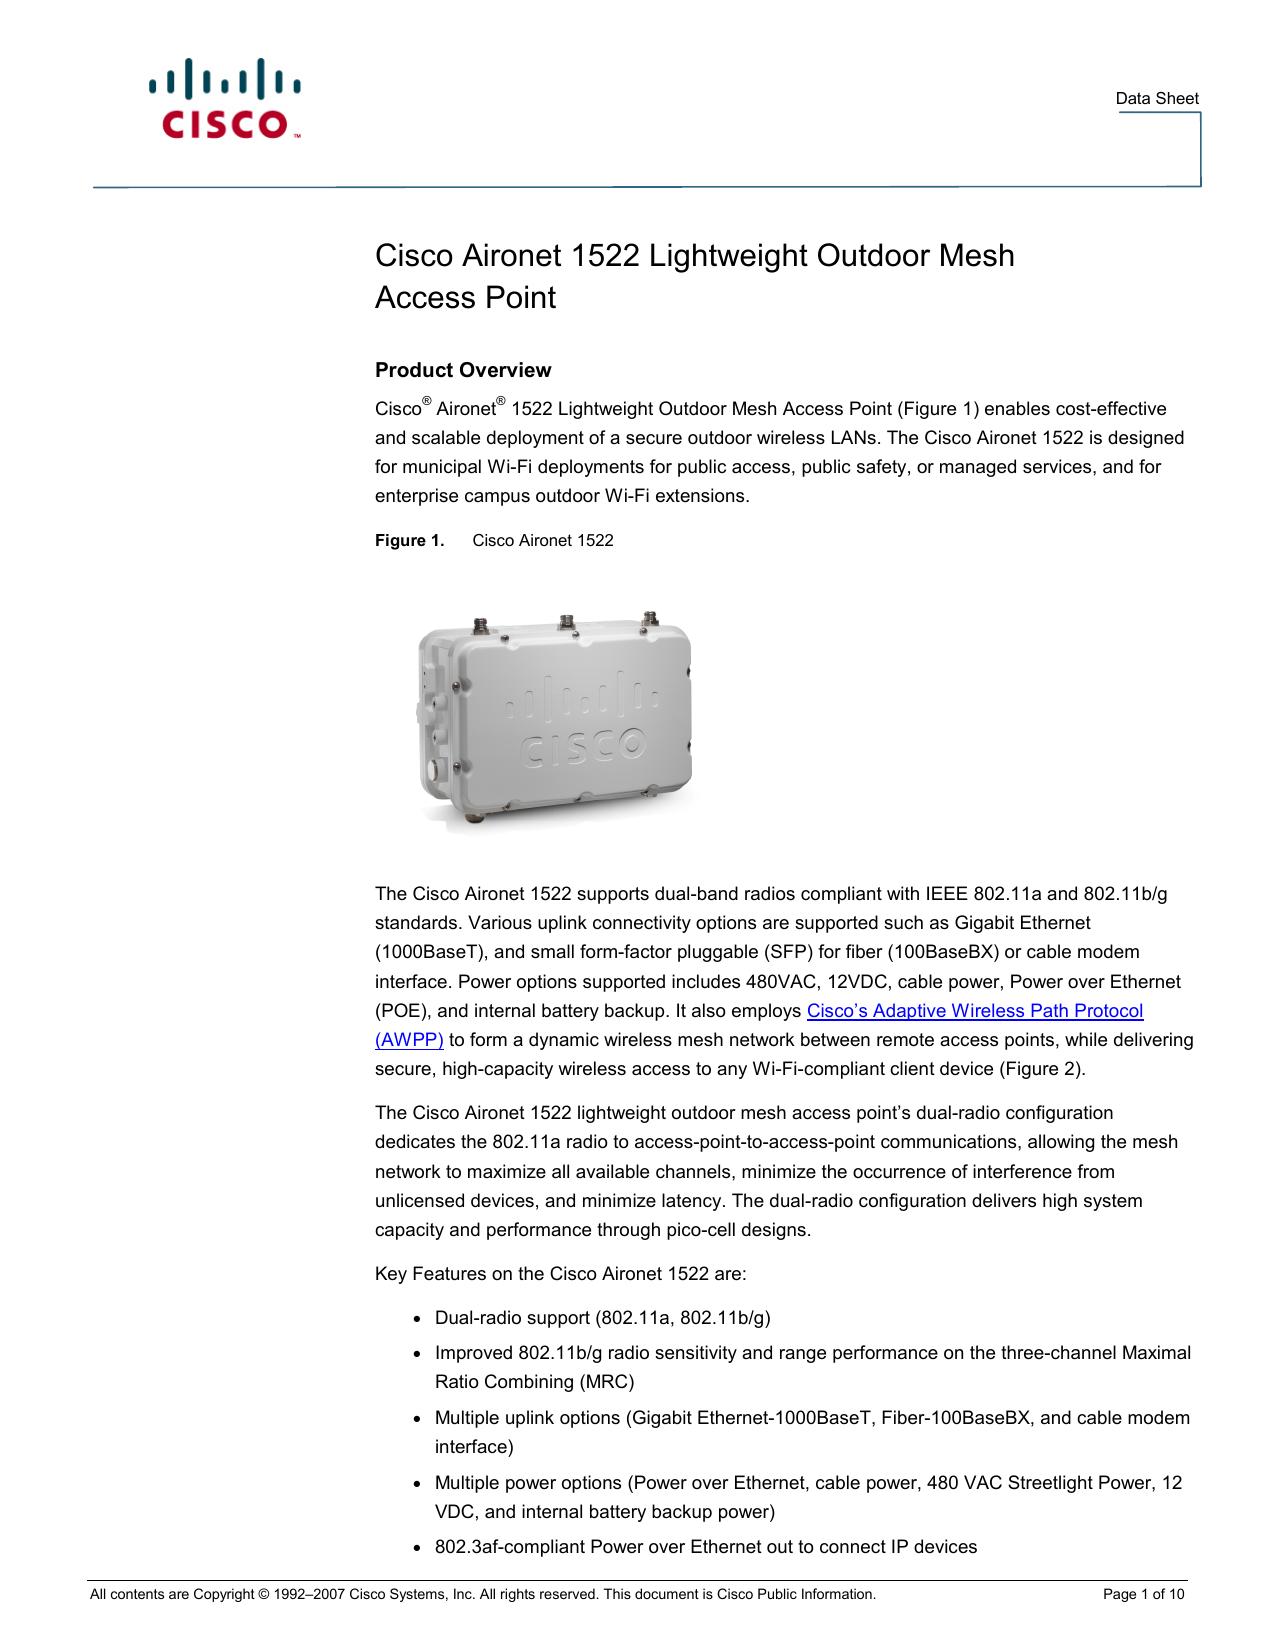 Cisco Aironet Air-LAP1522AG-A-K9 Outdoor Wireless Access Point 2.4Ghz Antenna